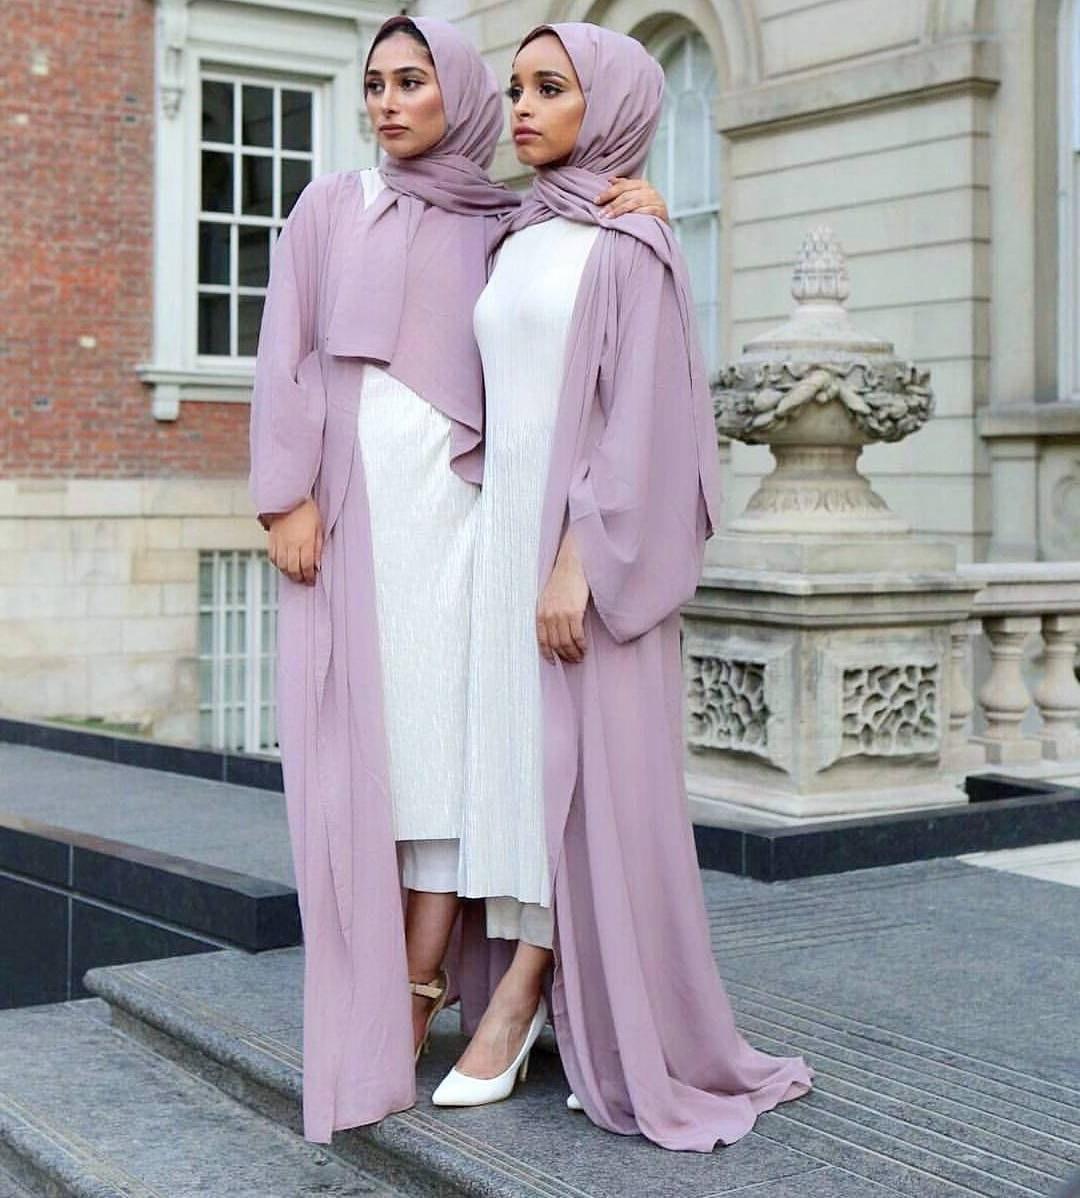 Bentuk Model Baju Lebaran Thn Ini O2d5 50 Model Baju Lebaran Terbaru 2018 Modern & Elegan